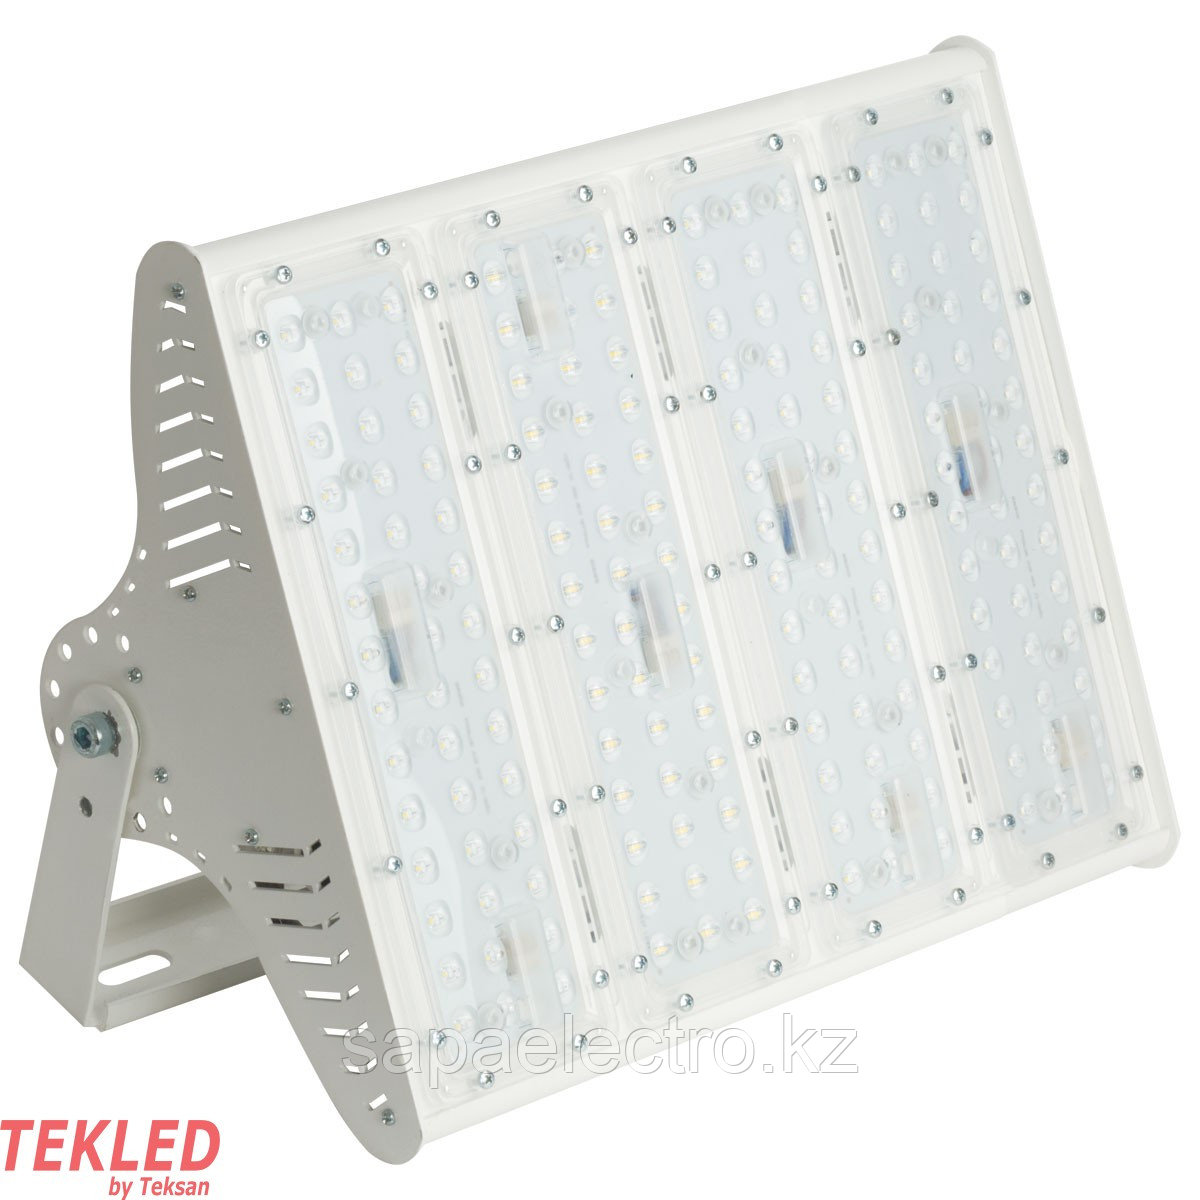 Прожектор LED SMART 4*30 (3 года гарантия) MATT WHI